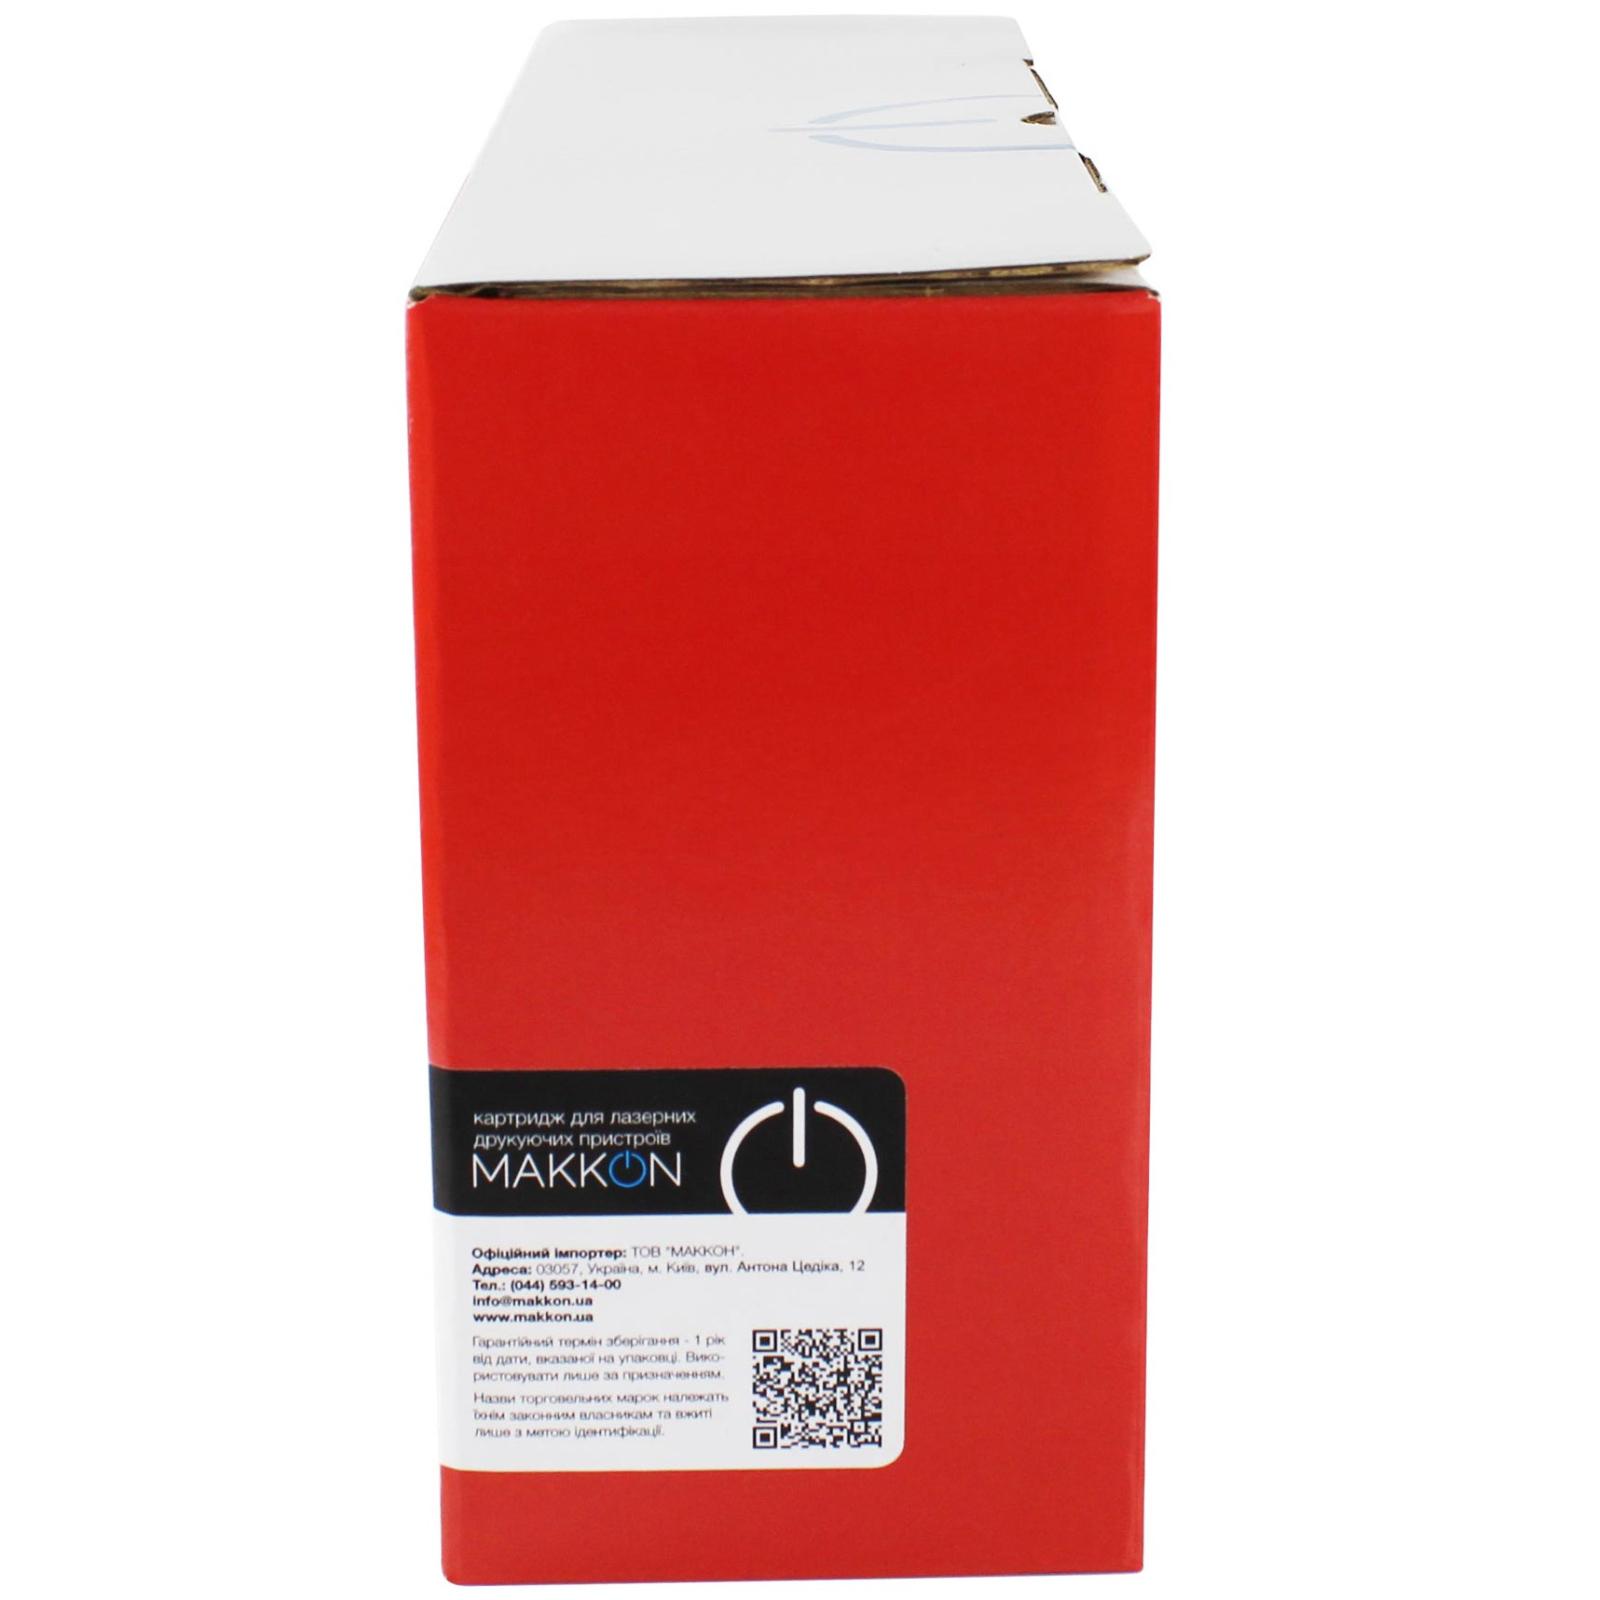 Картридж Makkon Samsung MLT-D117S 2.5k Black (MN-SAM-SD117S) изображение 2